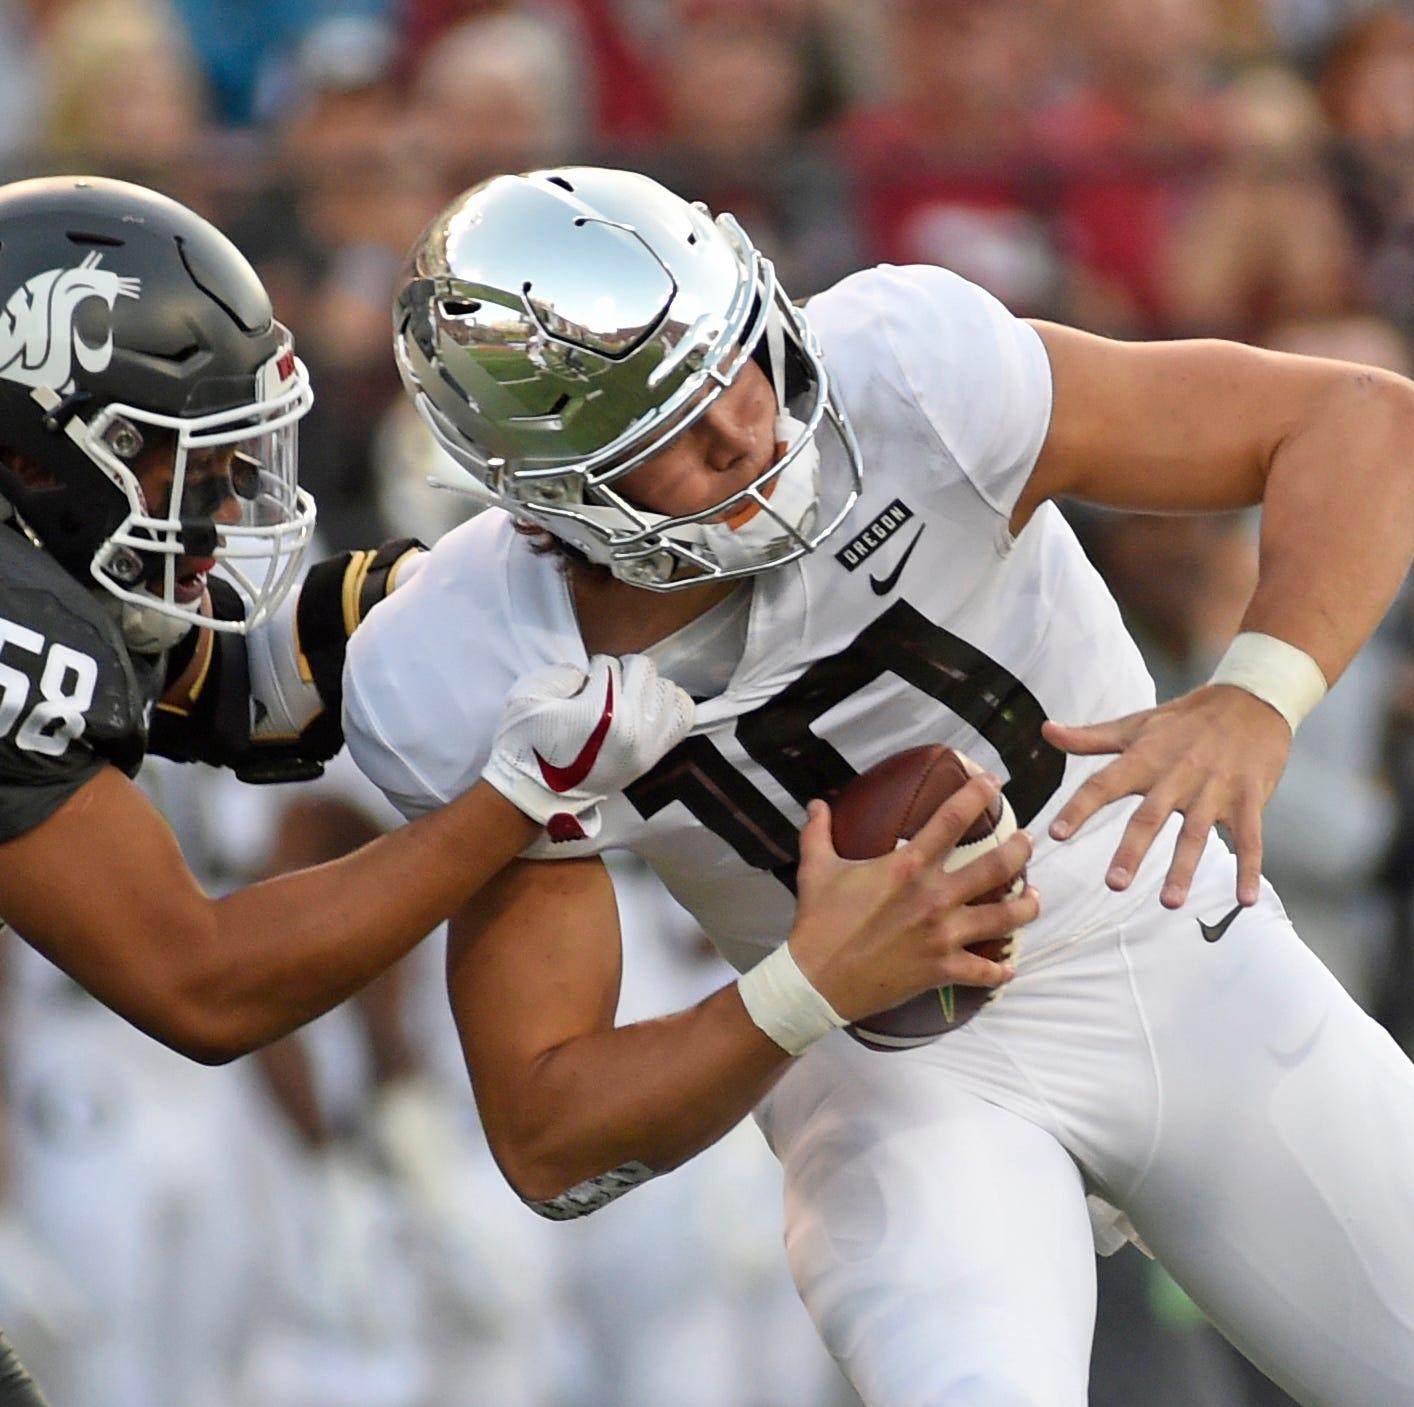 Oregon Ducks: 3 reasons for optimism despite loss to Washington State